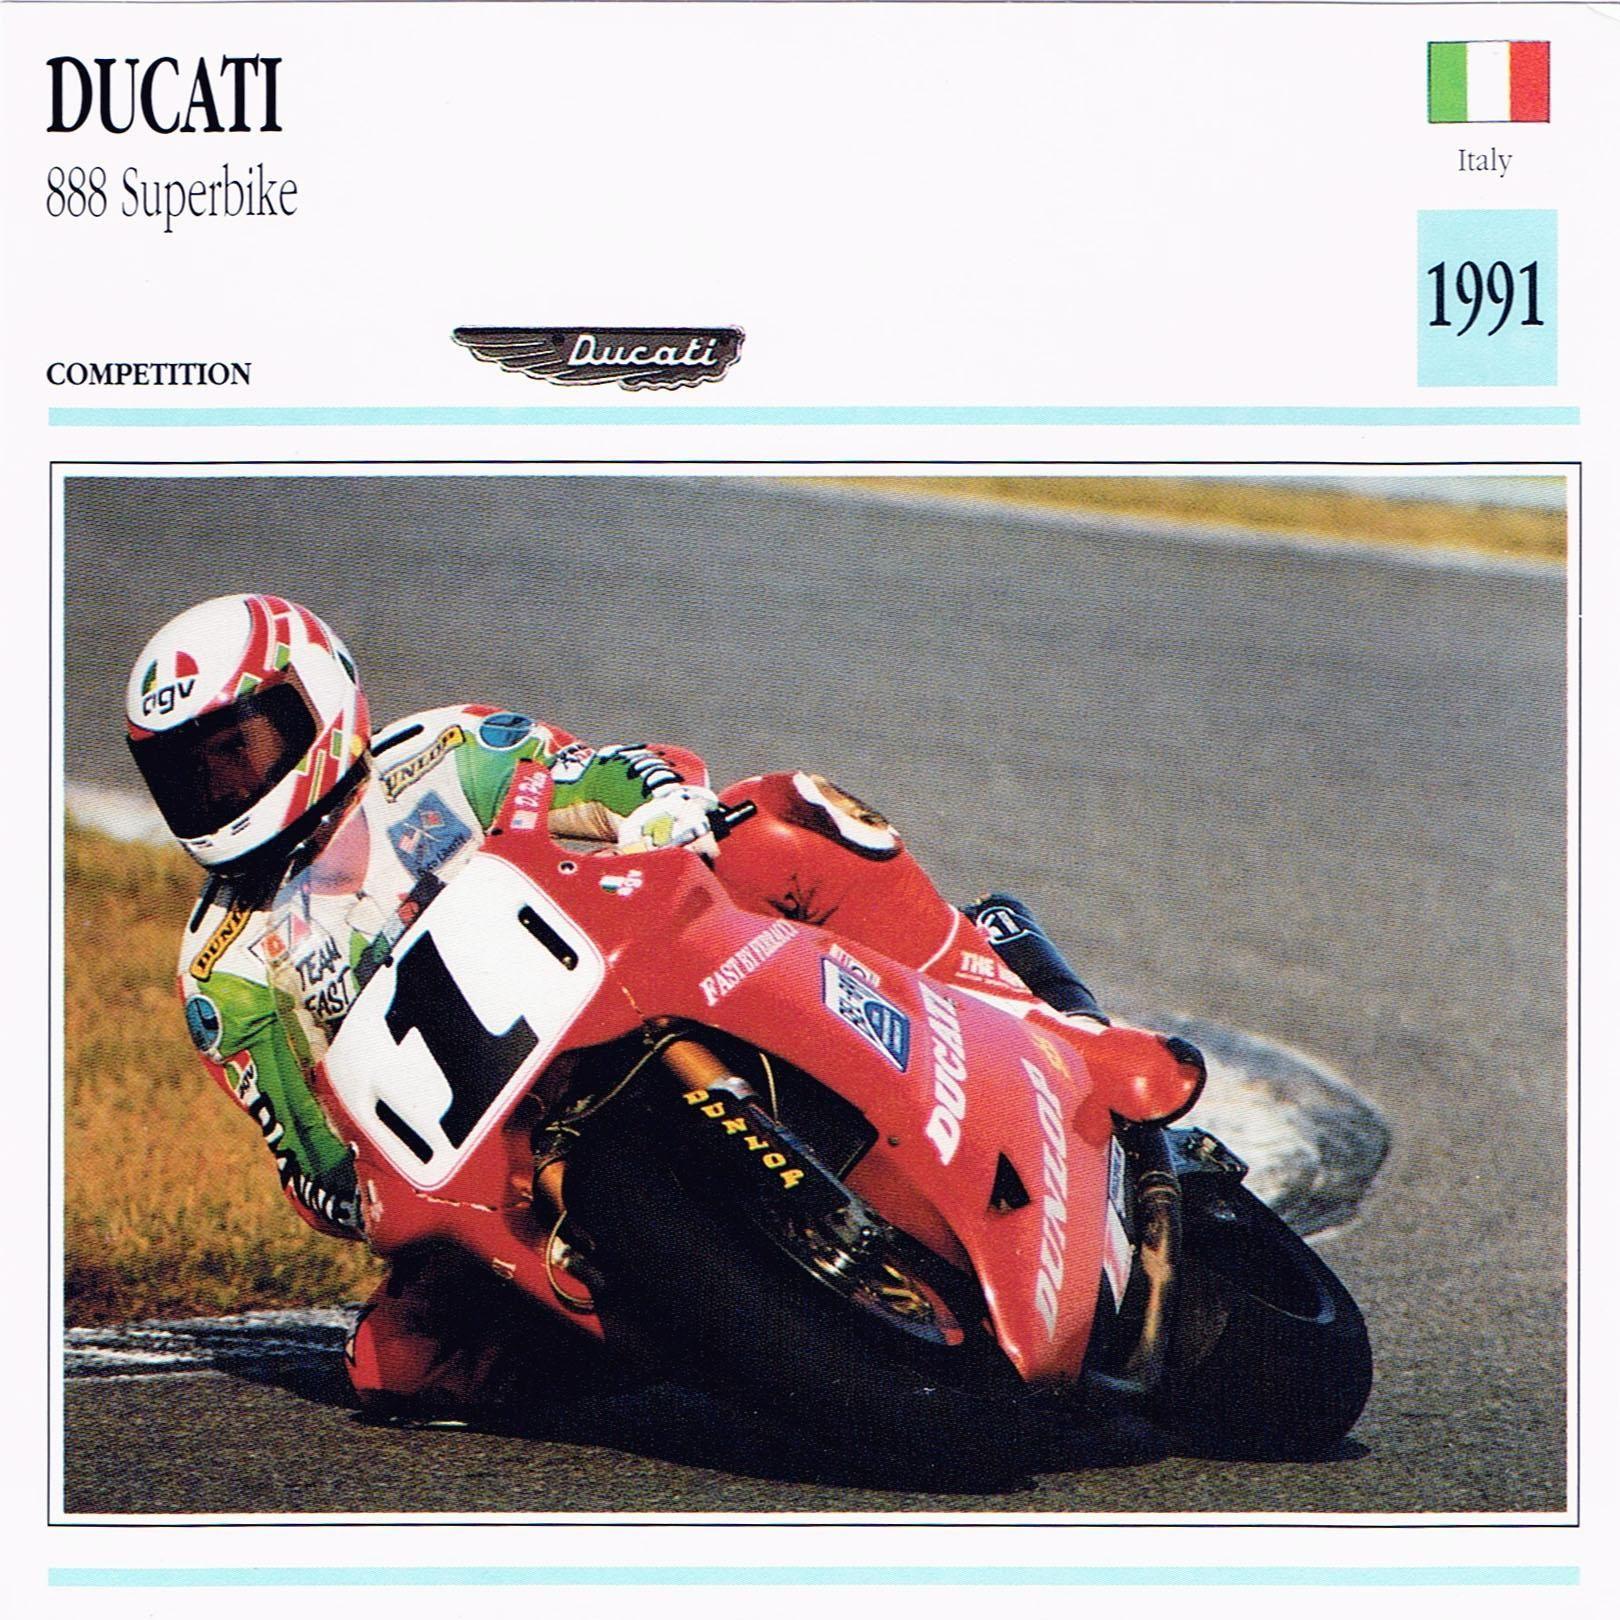 Ducati Yk Top Speed